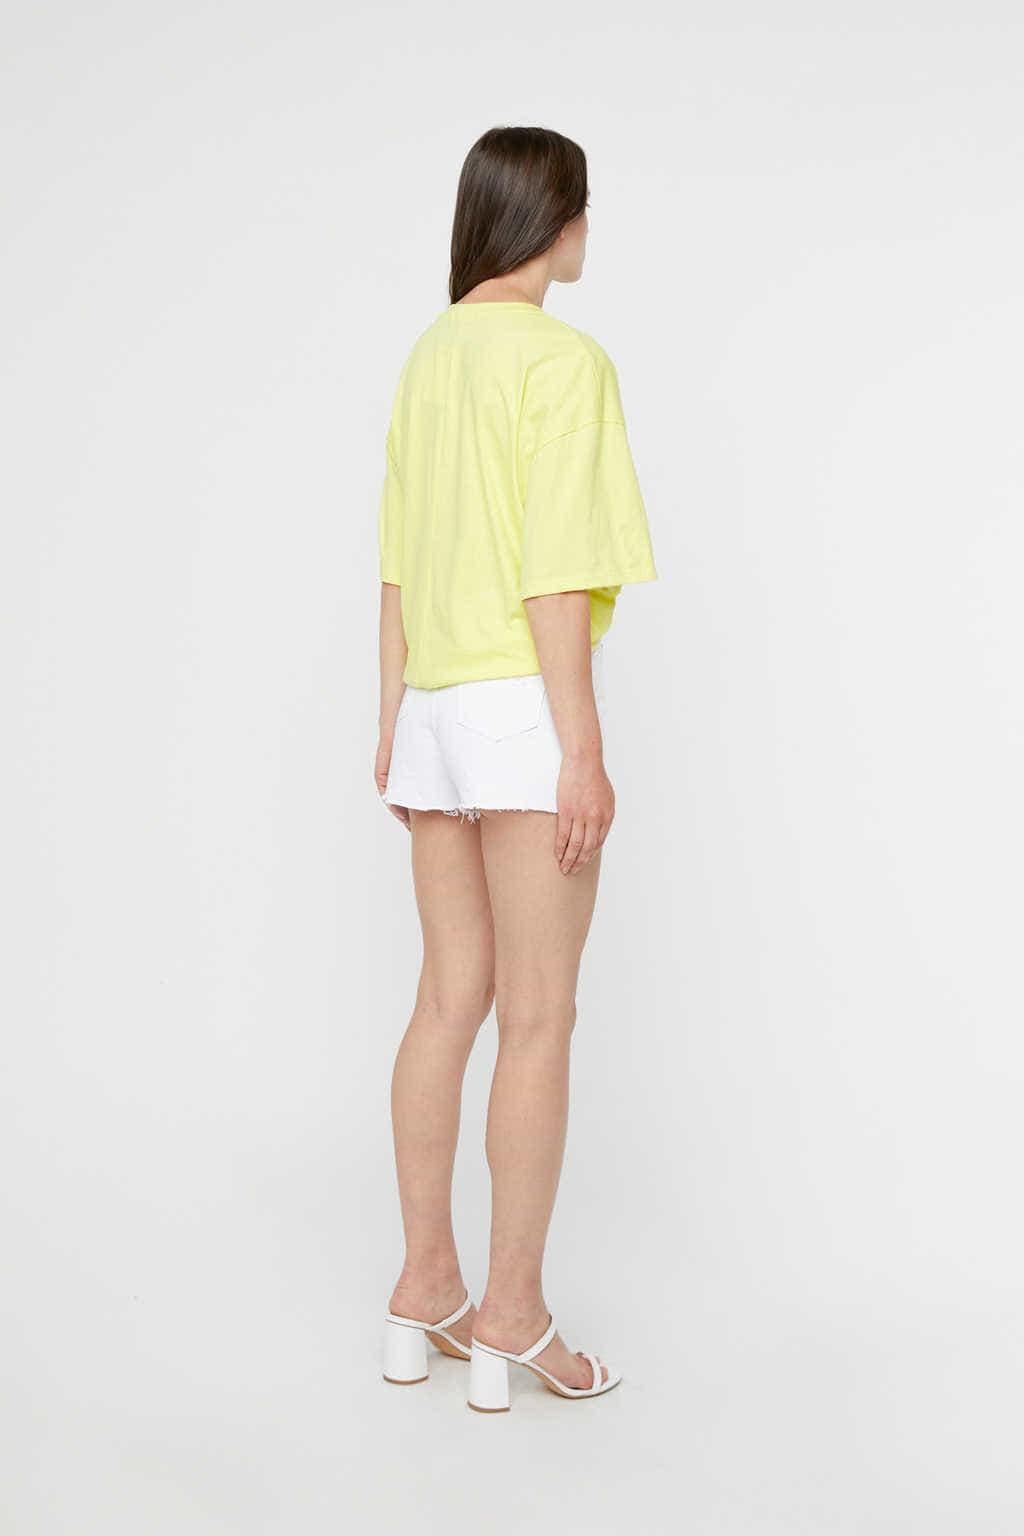 TShirt K151 Yellow 4